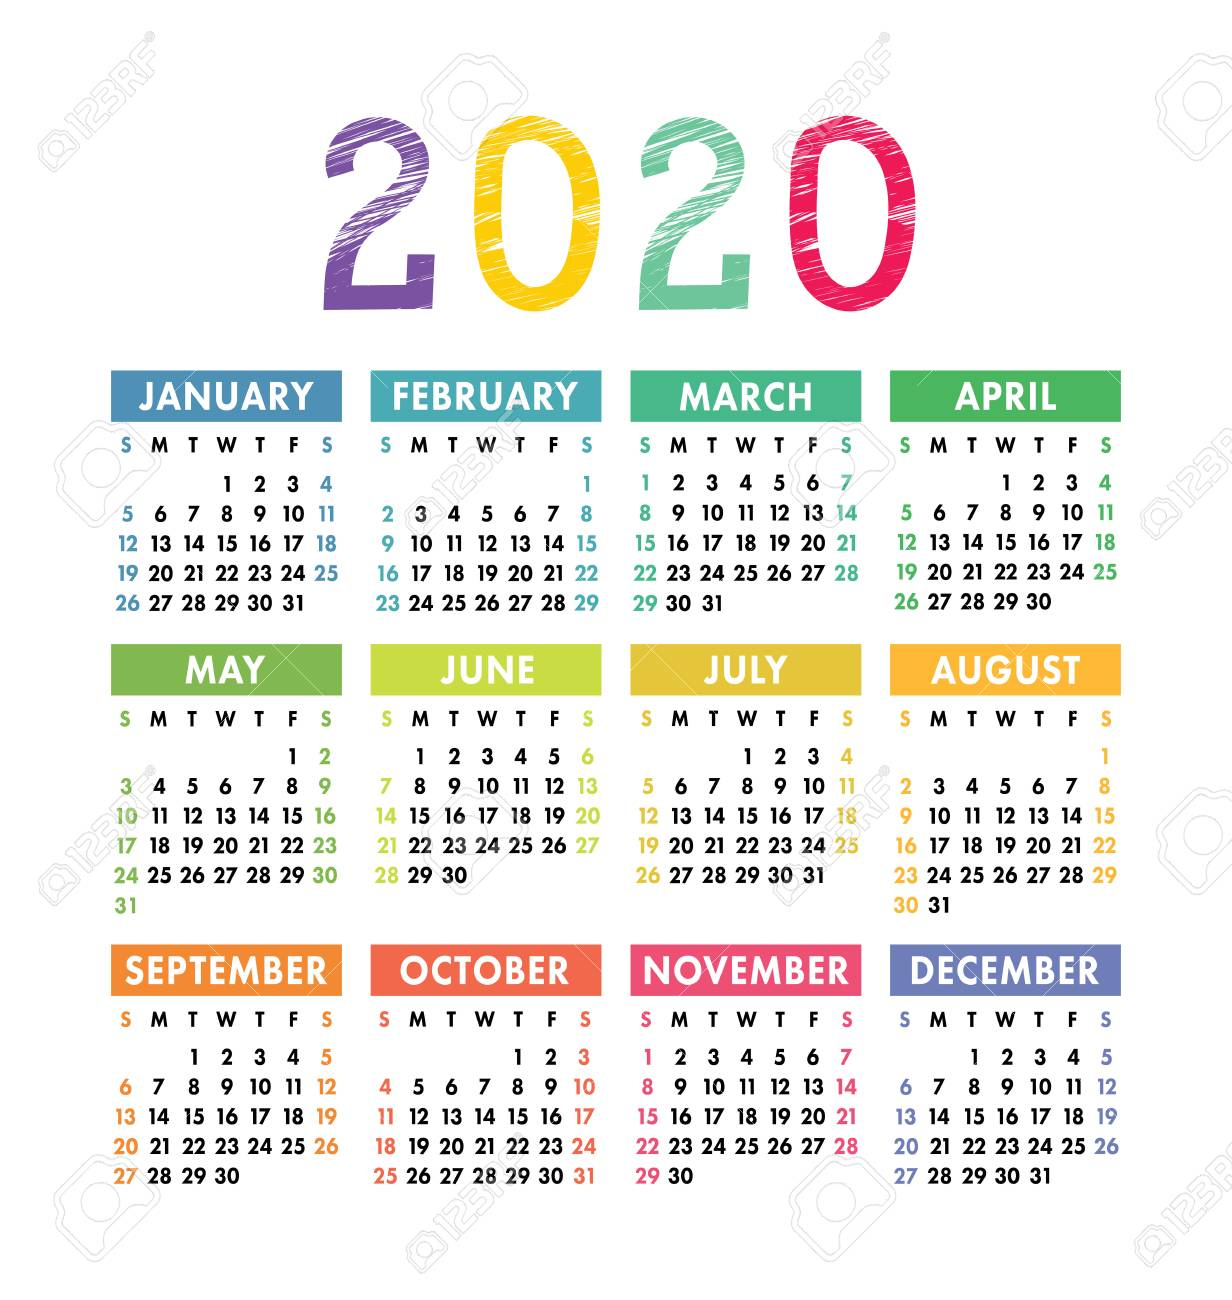 Collect 2020 Pocket Callendar